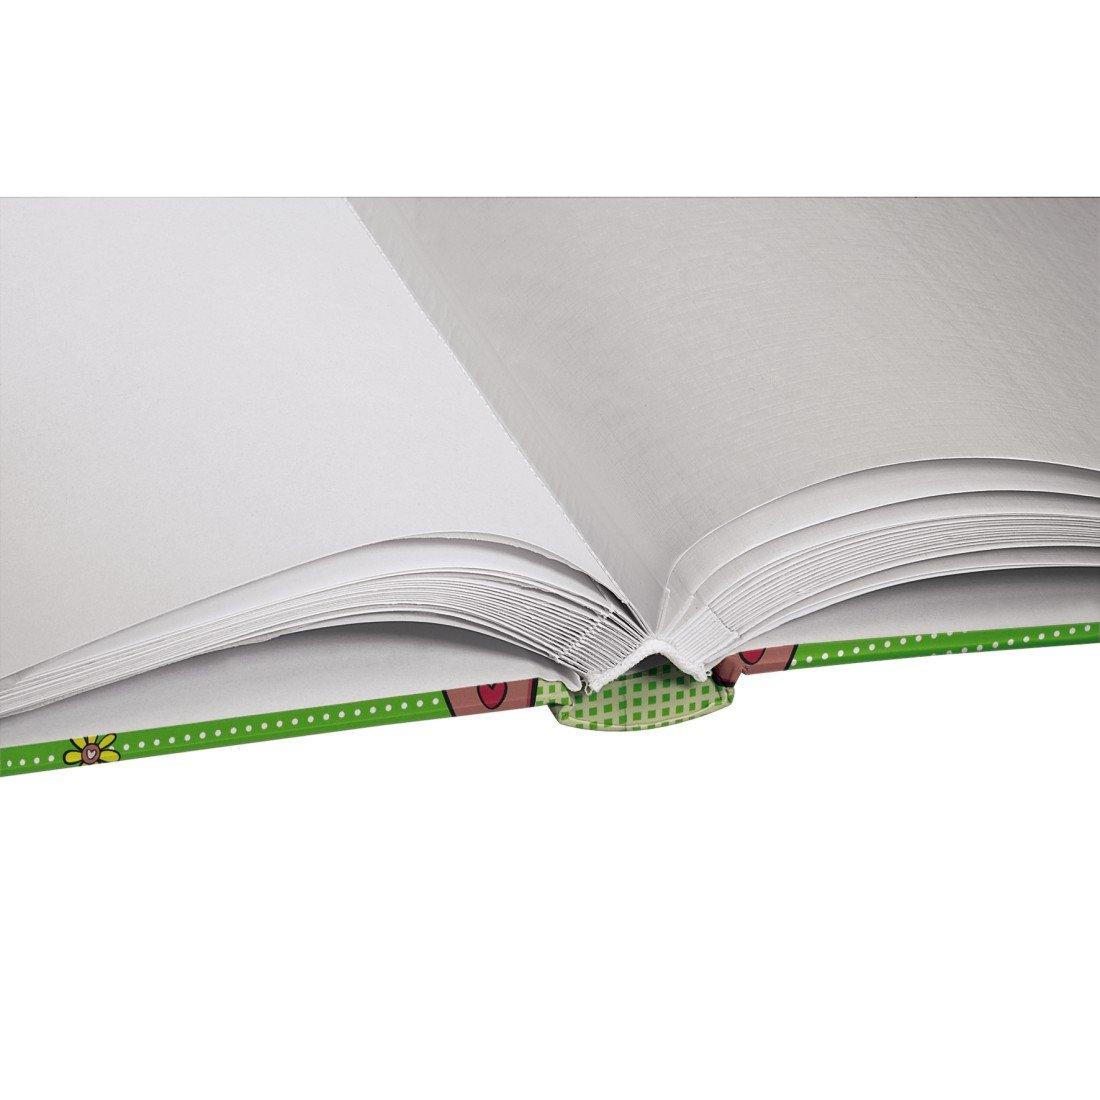 60 Seiten Hama Buchalbum Nele 27x31 cm